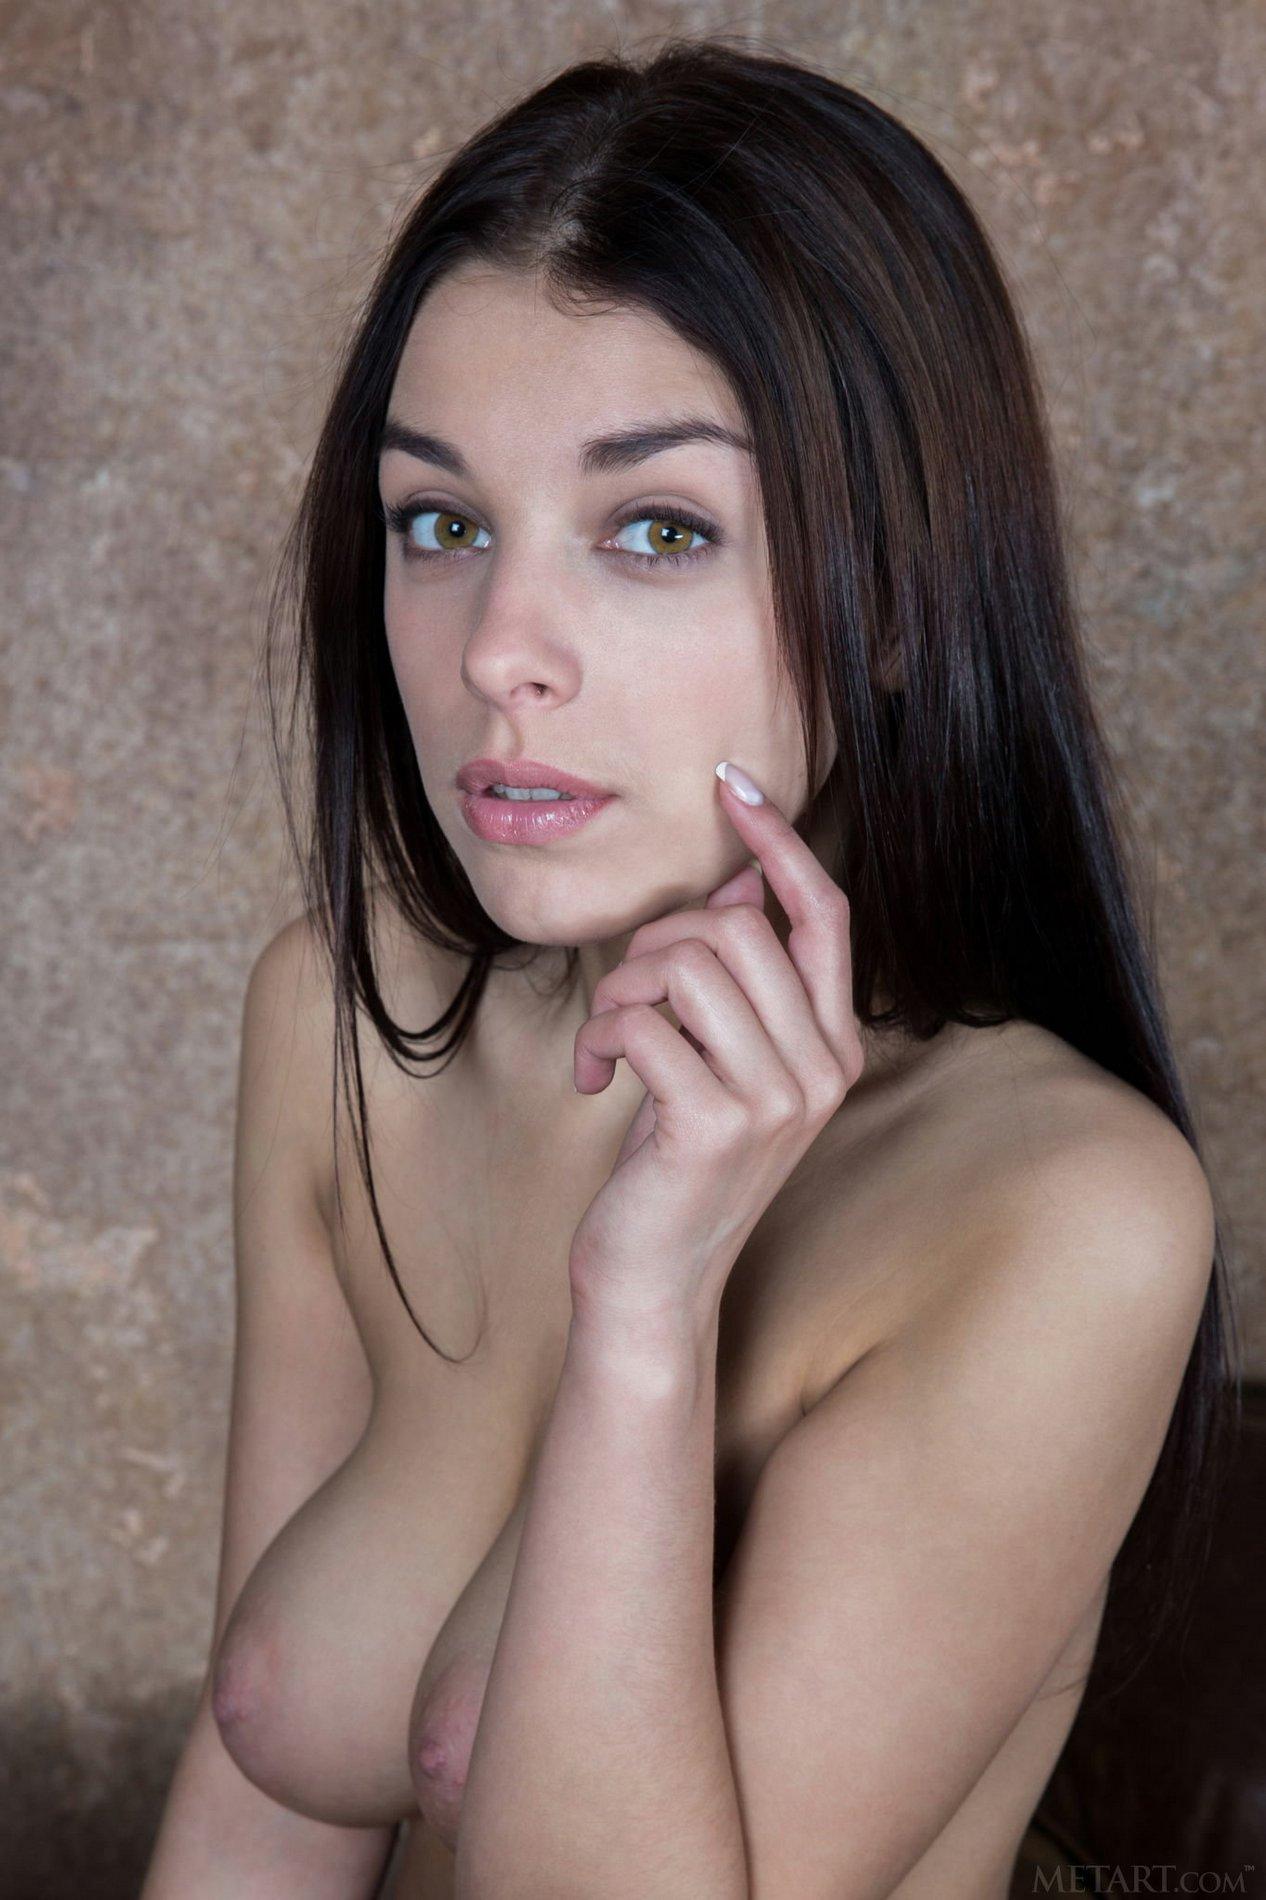 Evita Lima exposes her amazing body - My Pornstar Book